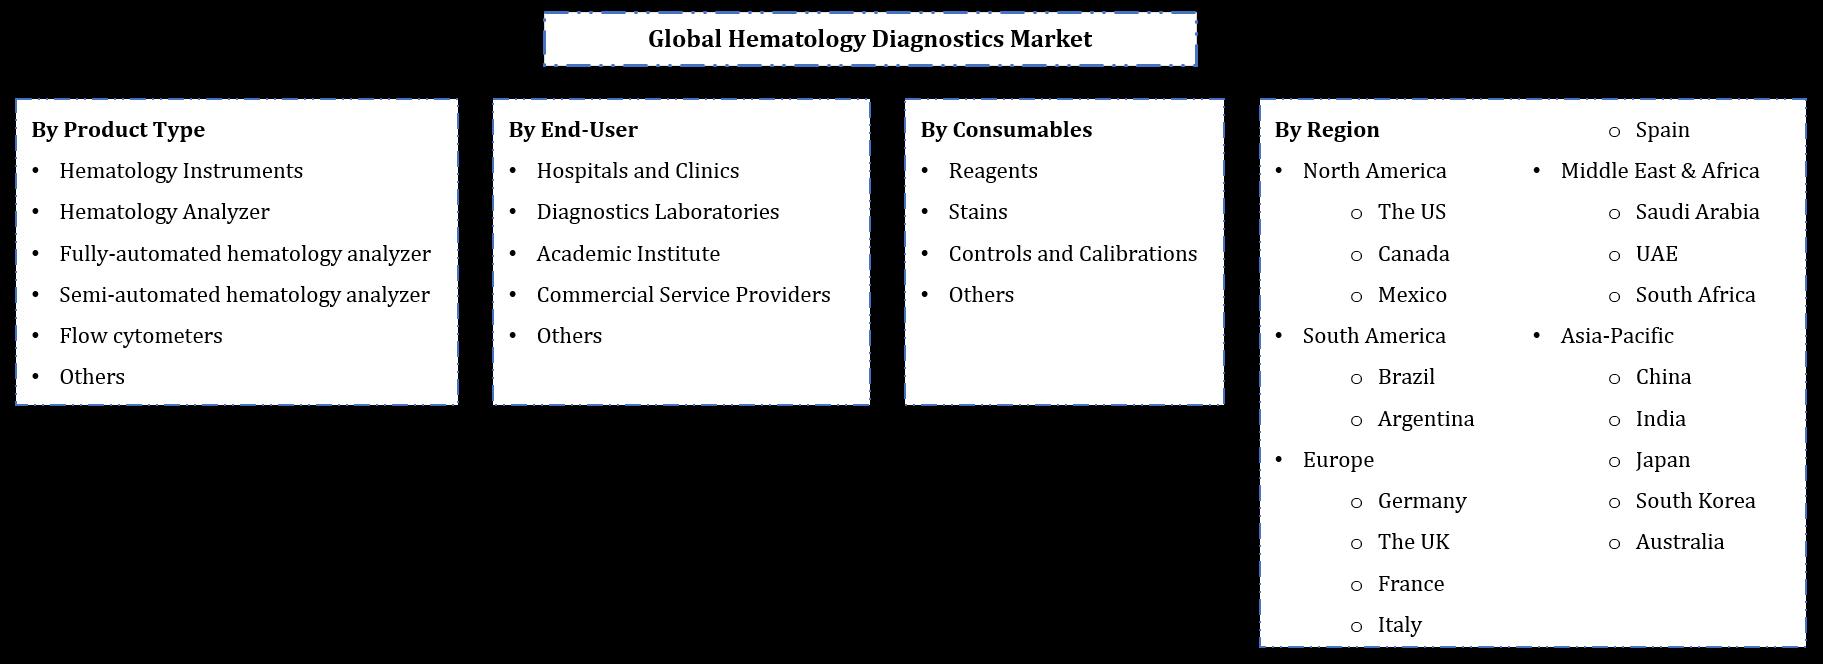 Hematology Diagnostics Market Segmentation